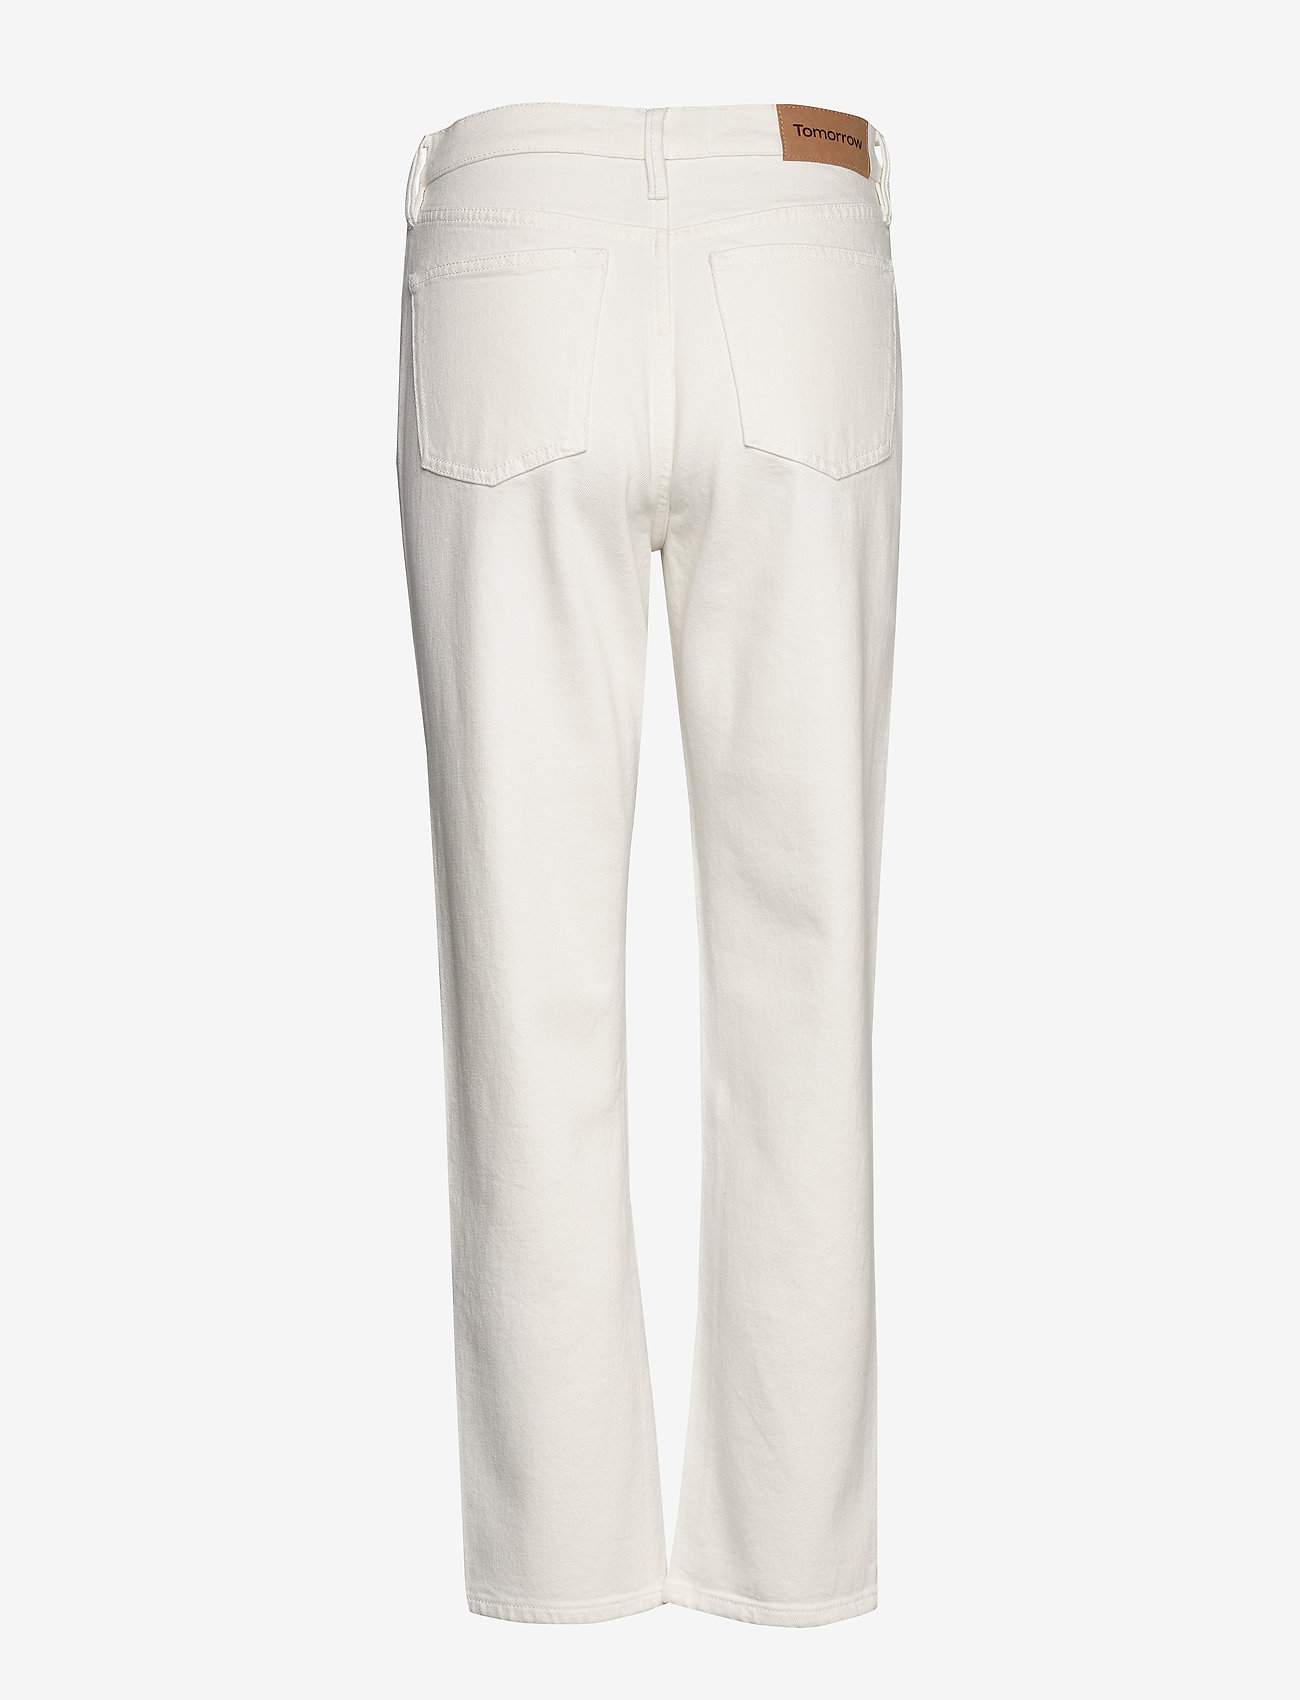 Tomorrow - Teresa regular jeans ecru - straight regular - ecru - 1